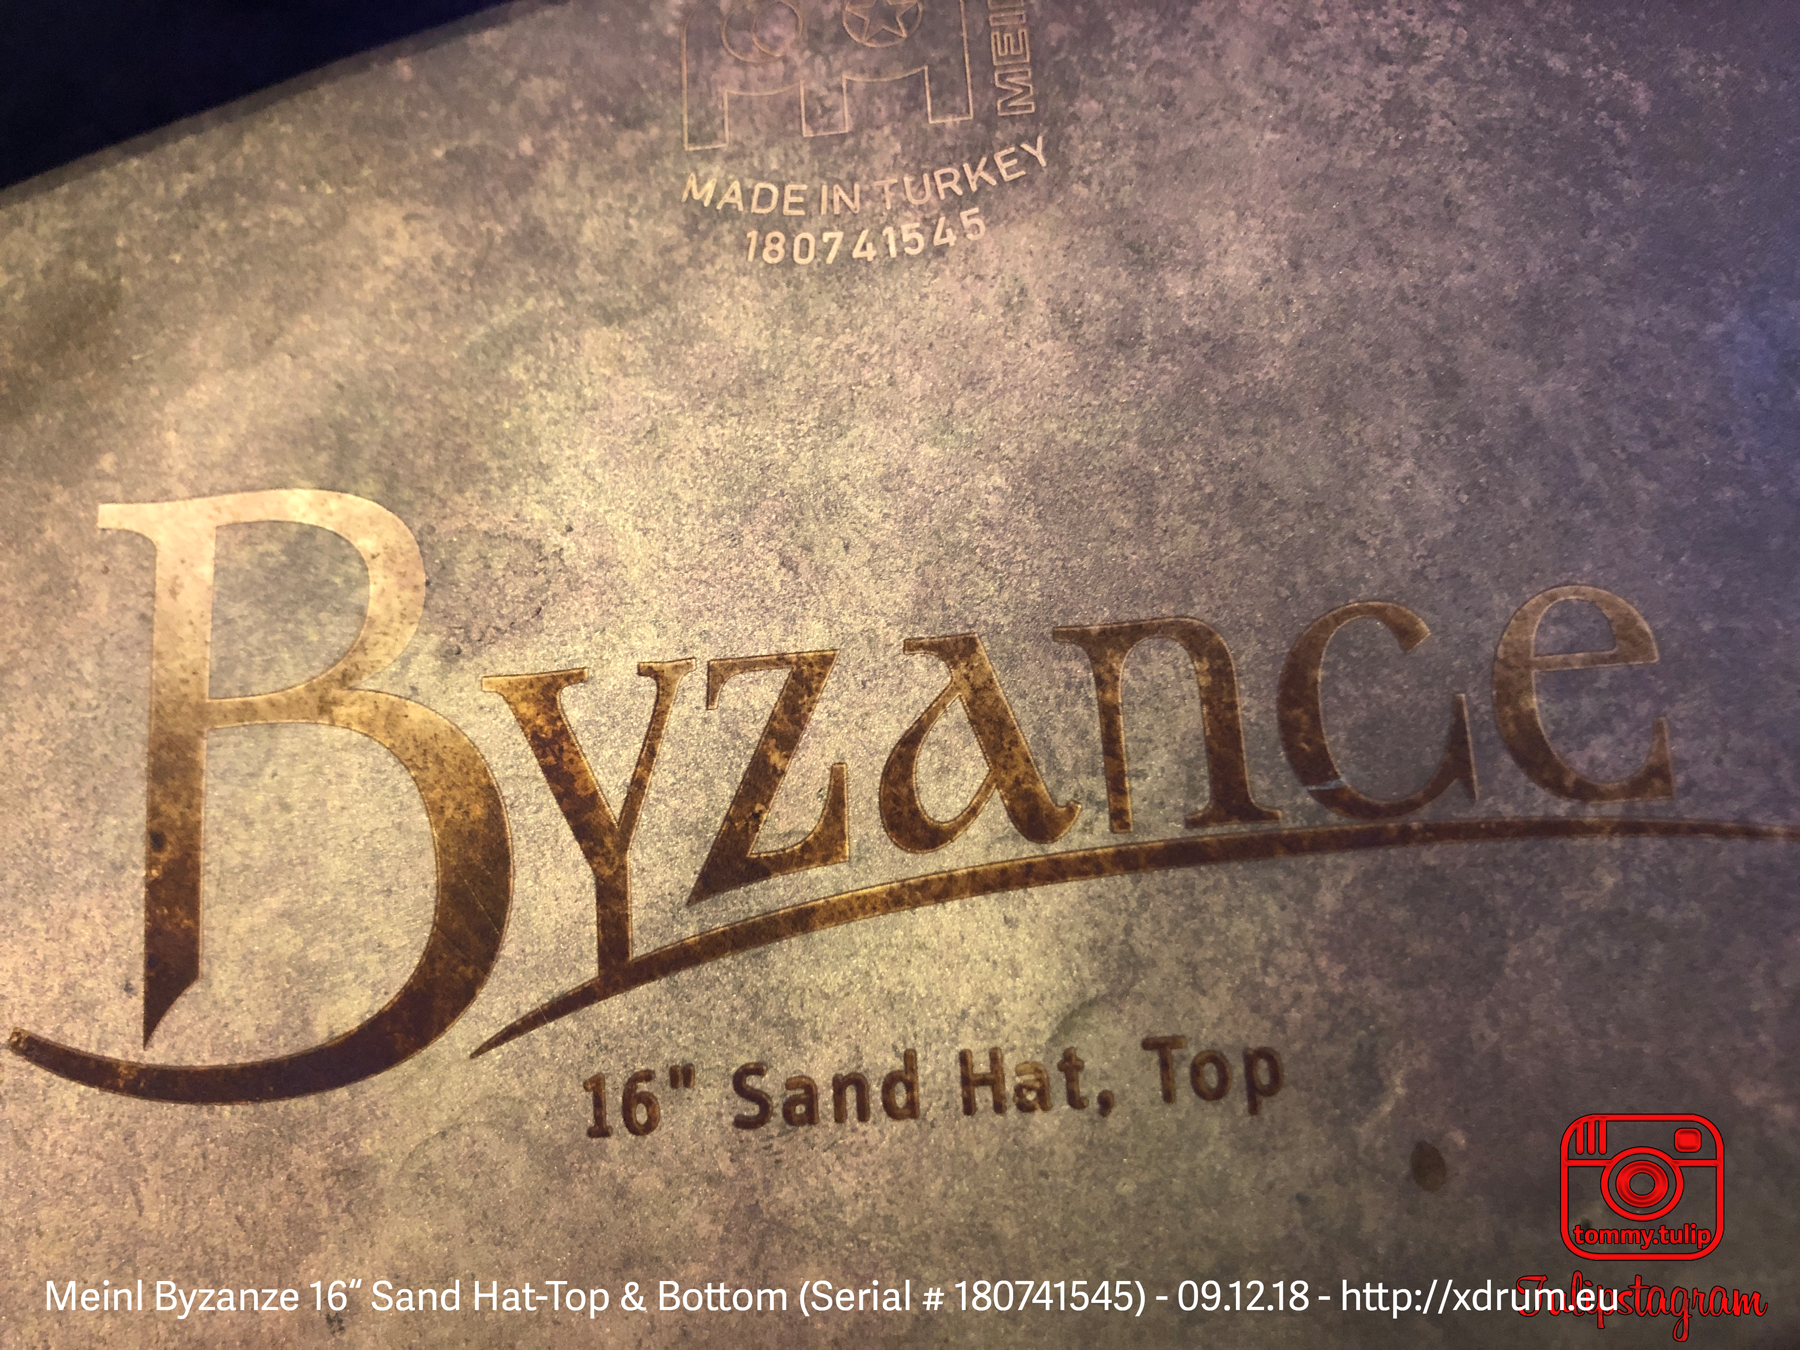 "Meinl Sand Hat, Top & Bottom 16"" (Serial # 180741545) - 09.12.18 (© #TTT)"